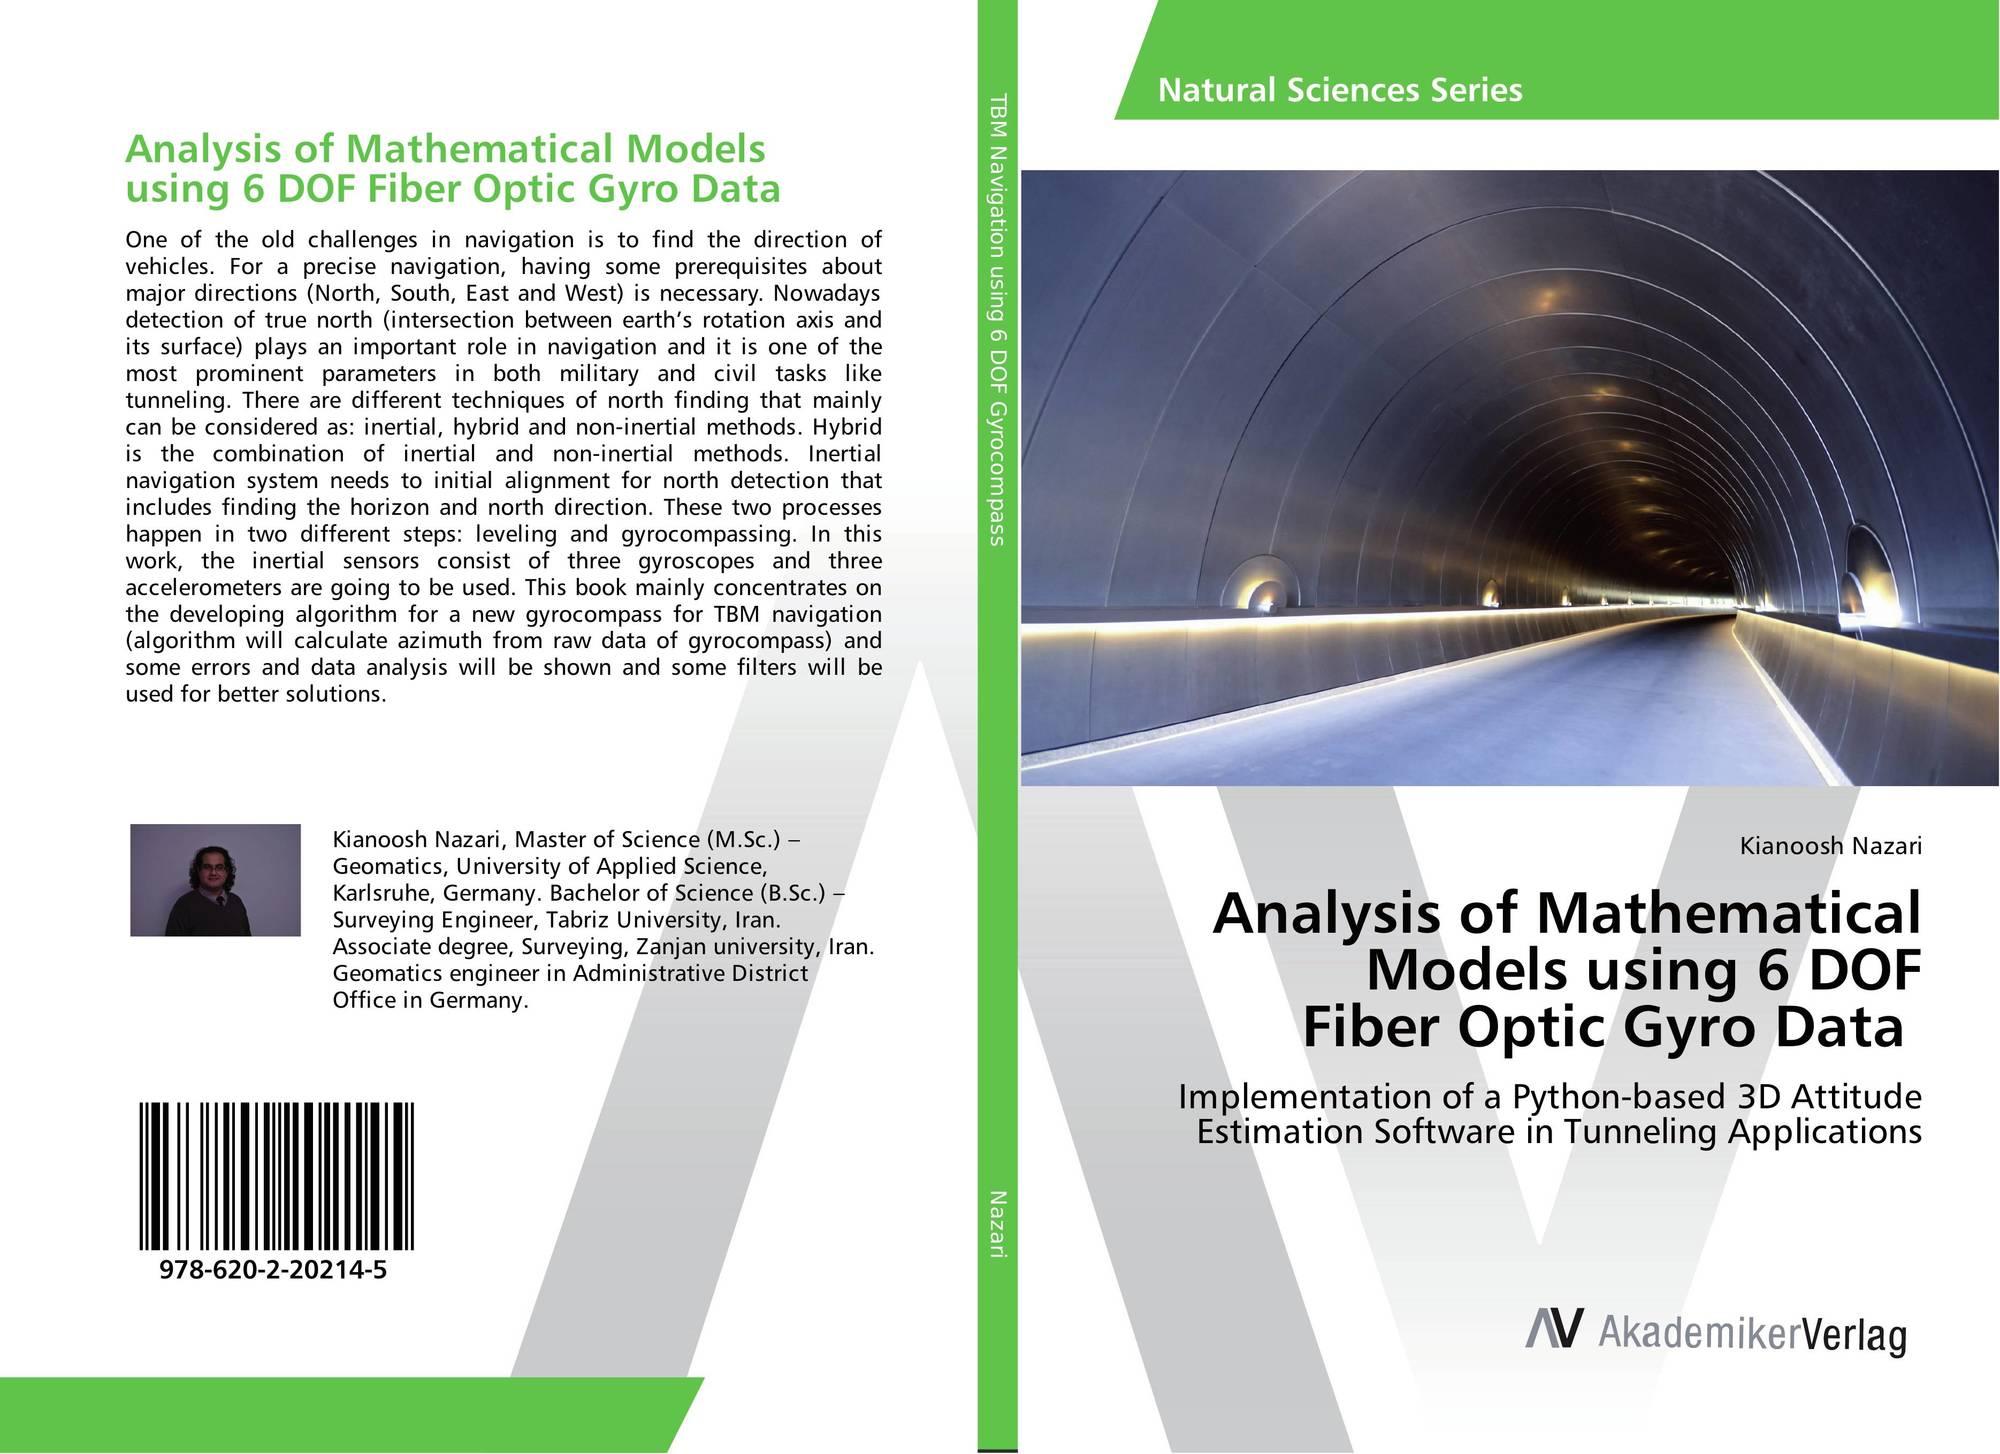 Analysis of Mathematical Models using 6 DOF Fiber Optic Gyro Data